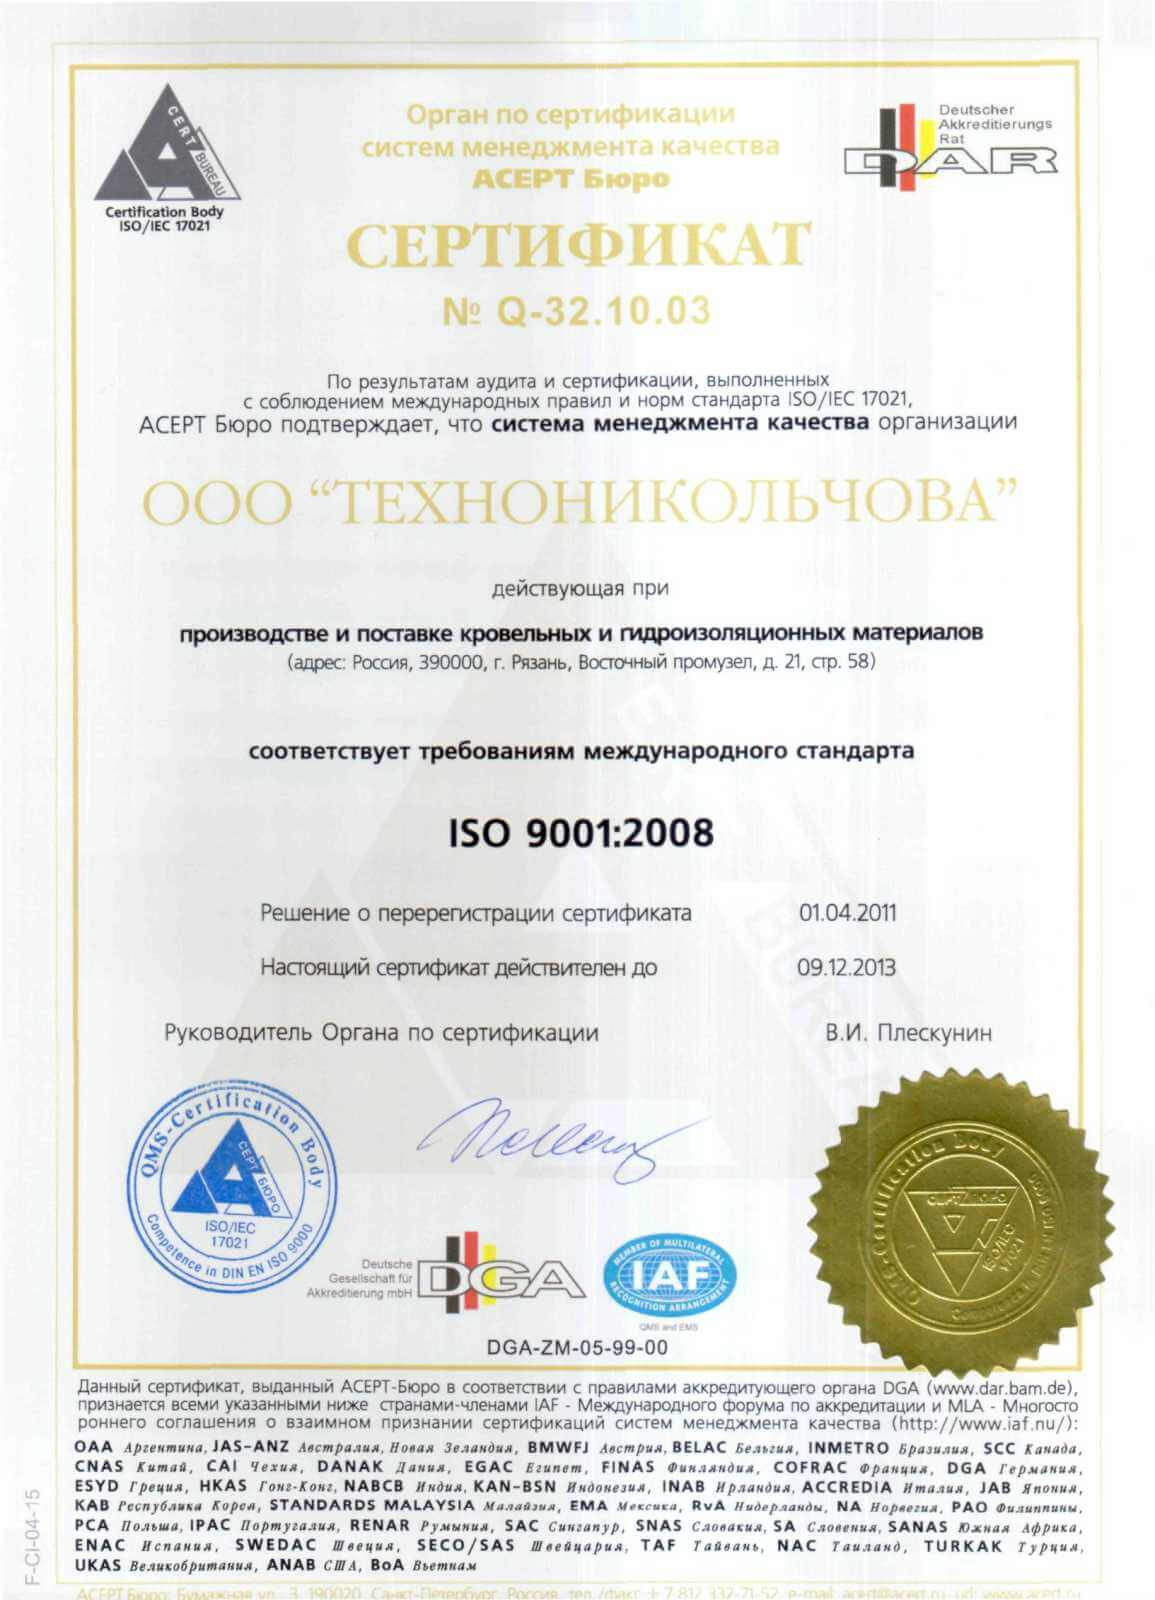 Сертификат соответствия ISO Шинглас